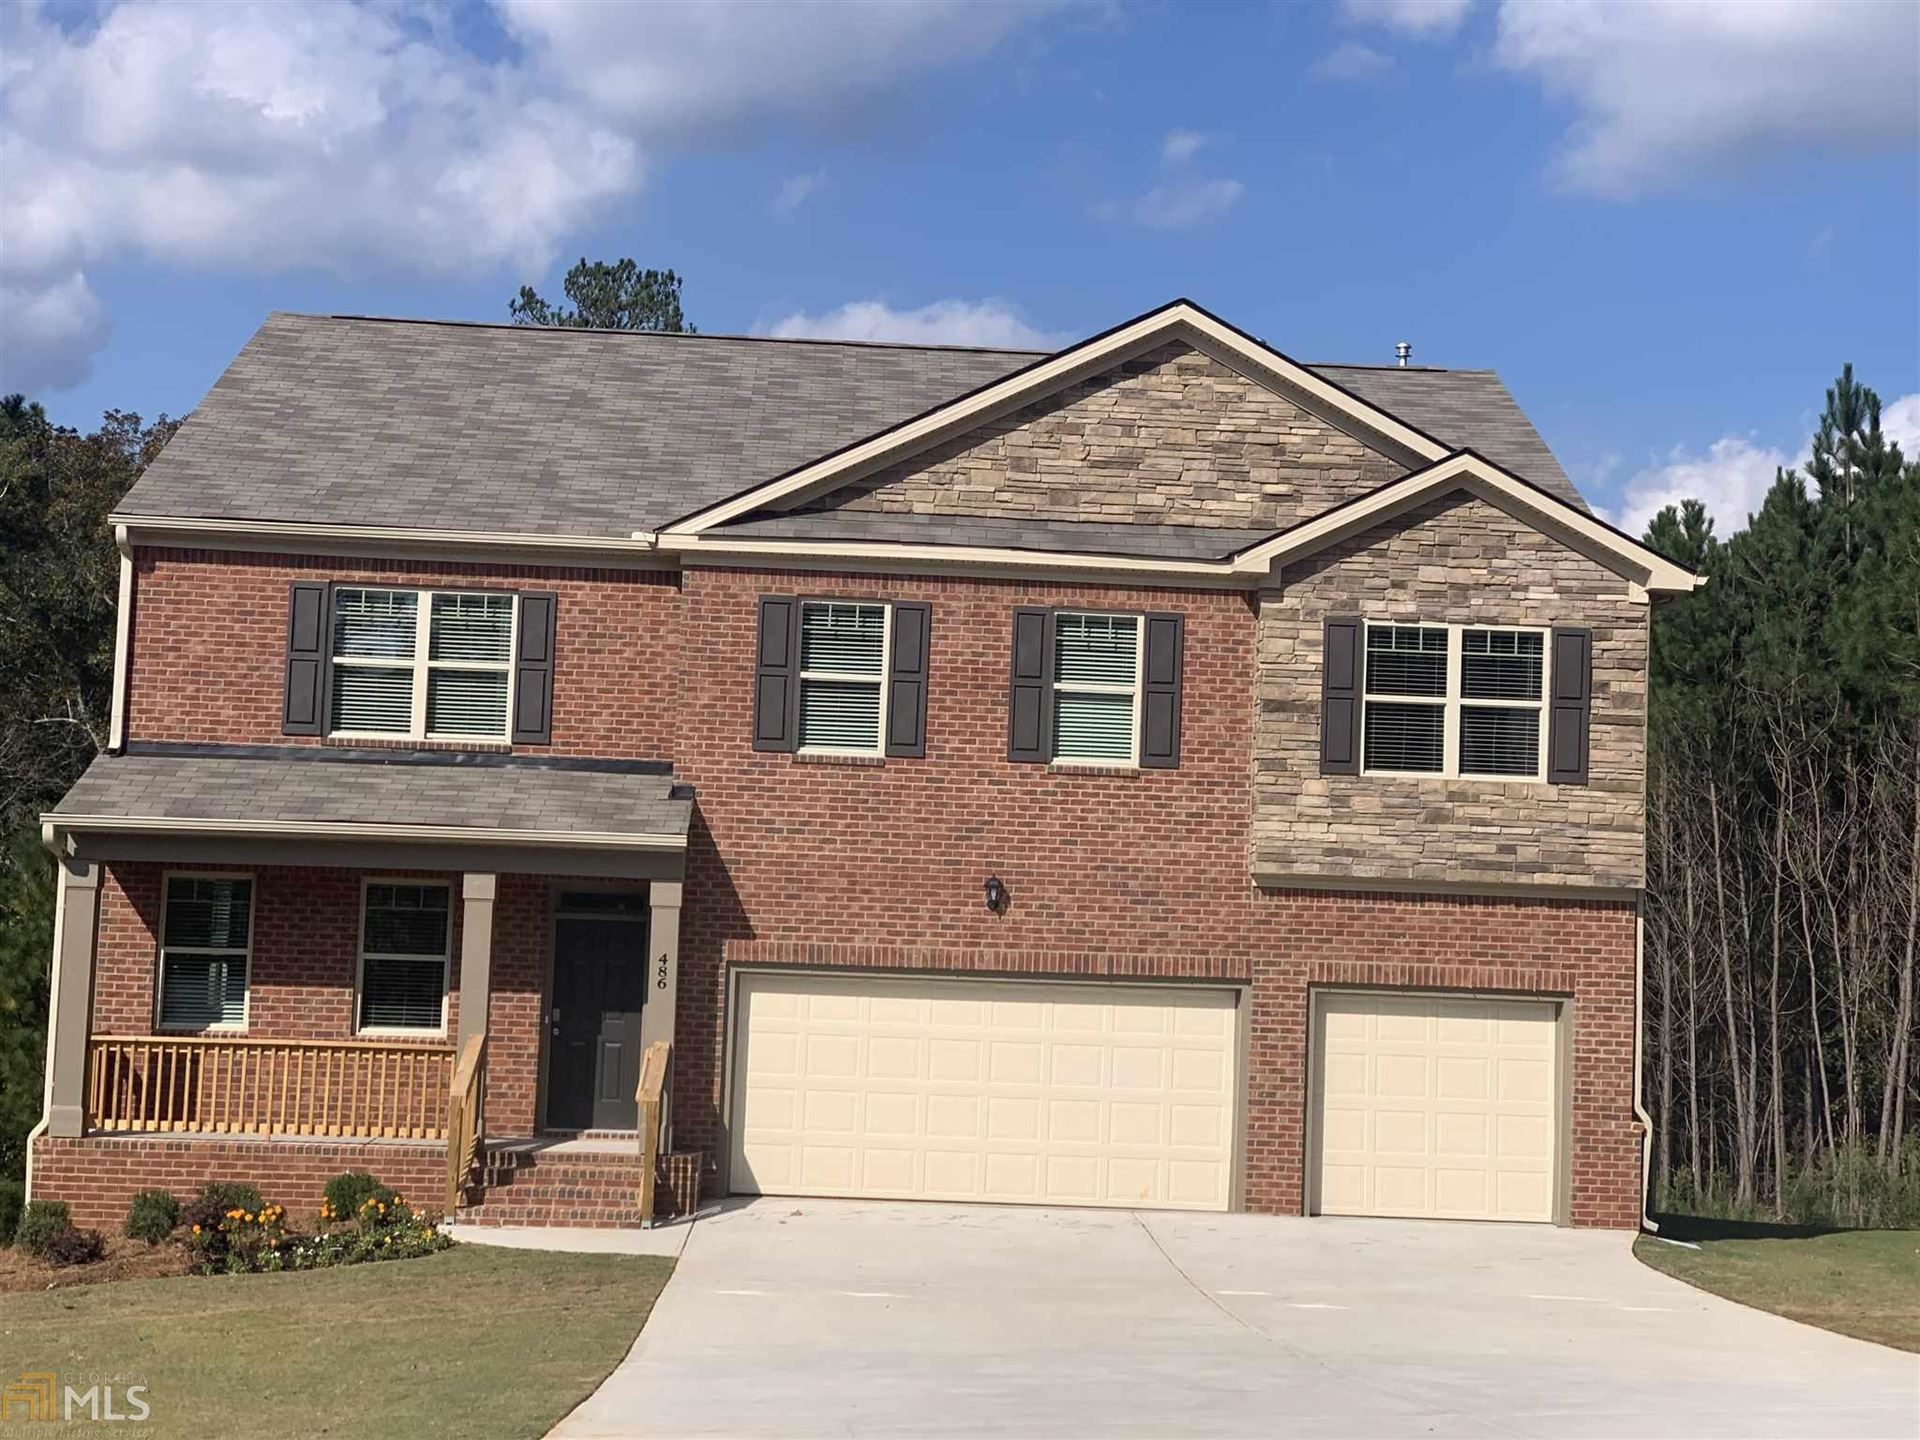 829 Tallowtree Ln, McDonough, GA 30252 - MLS#: 8880109